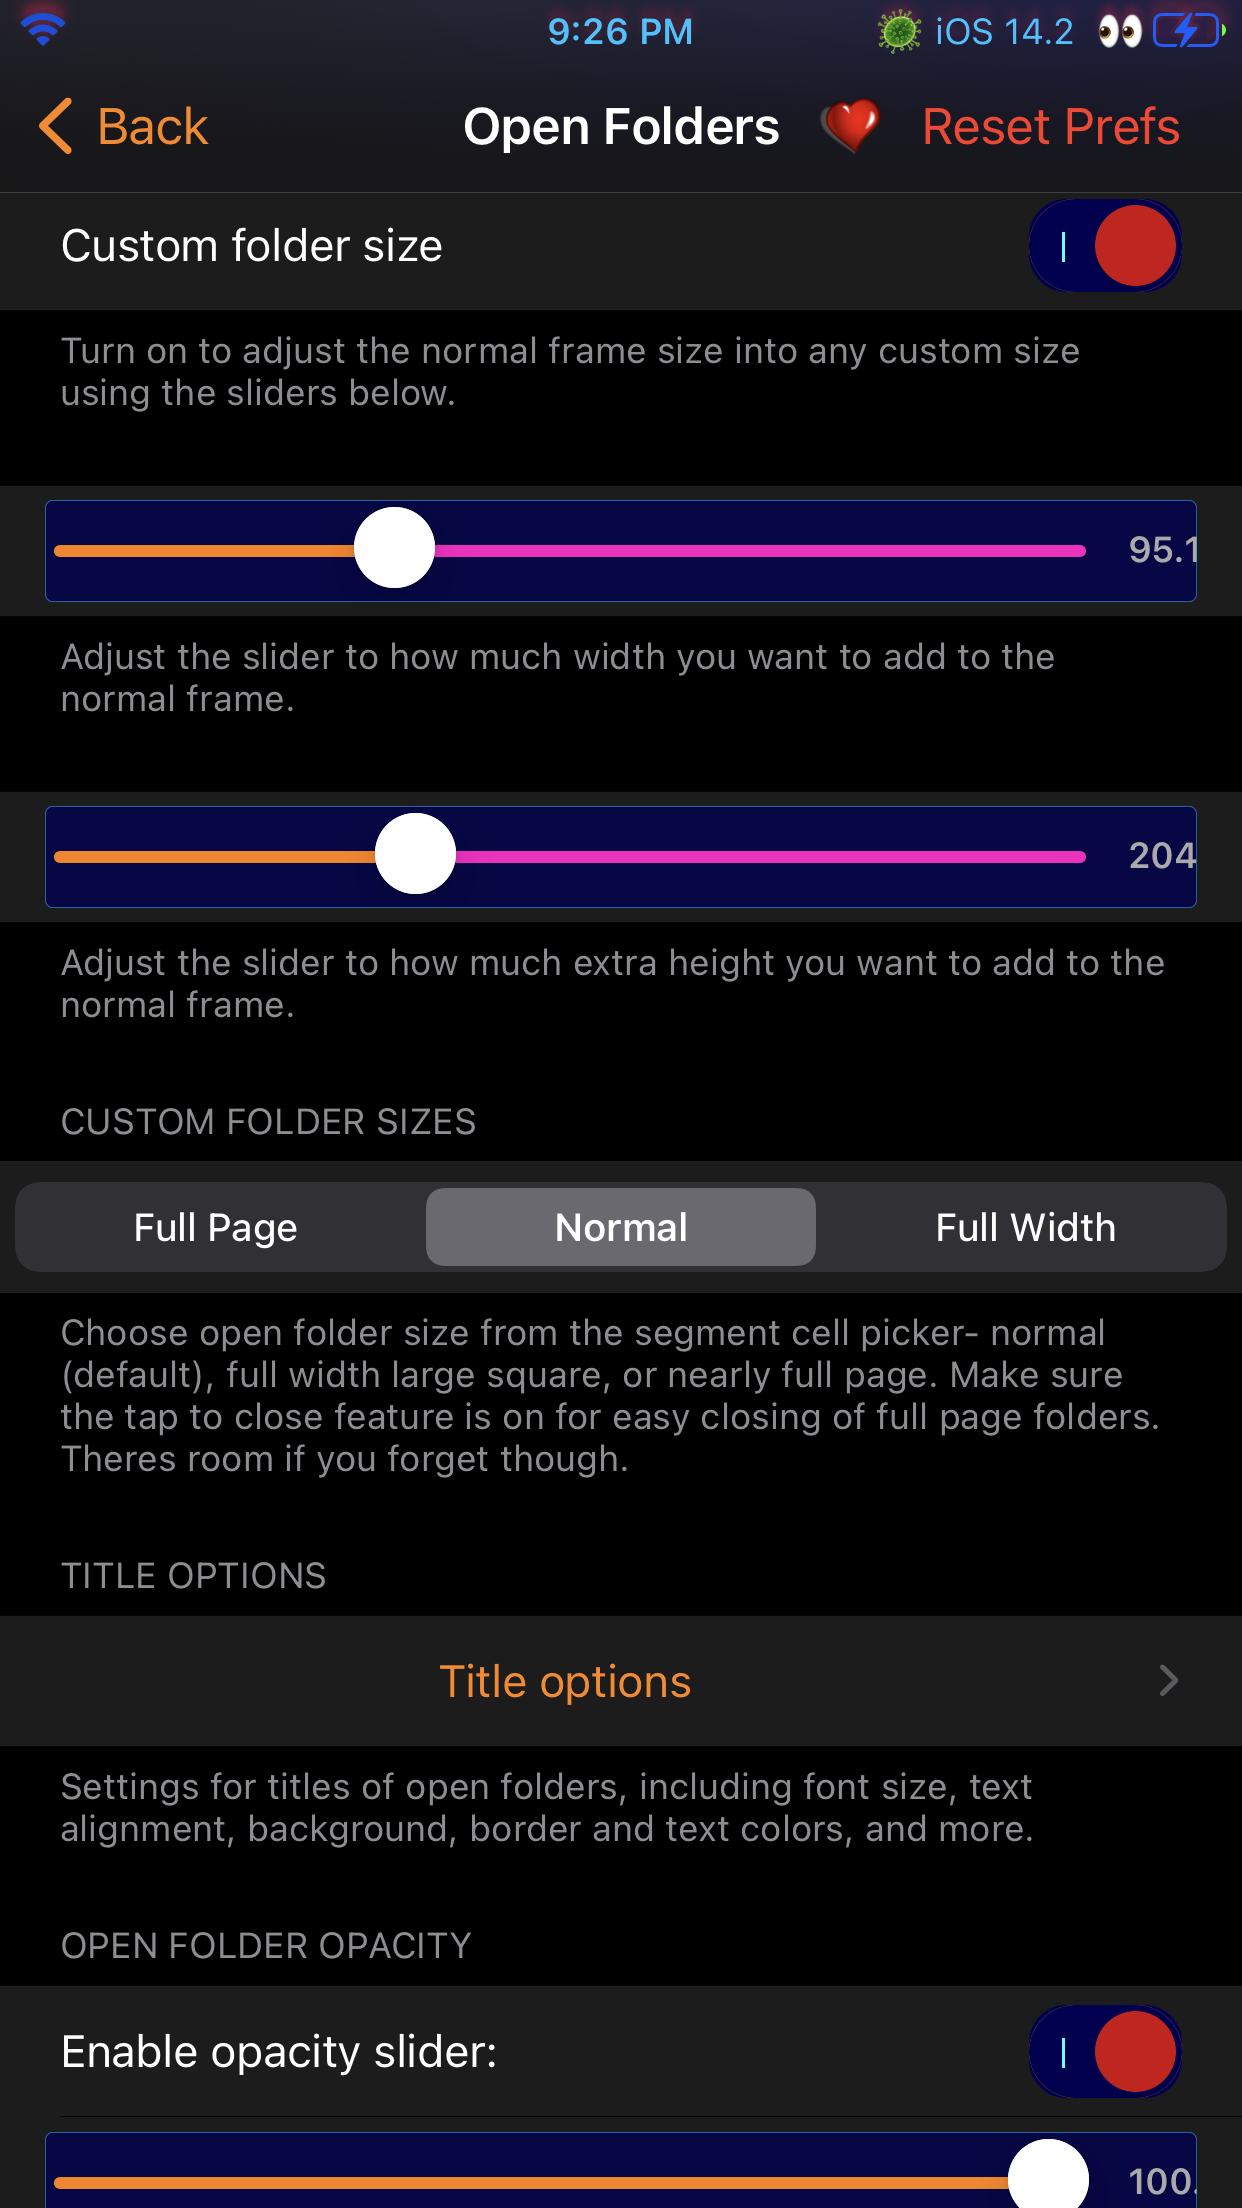 FolderController14 - 1.0.0beta-27